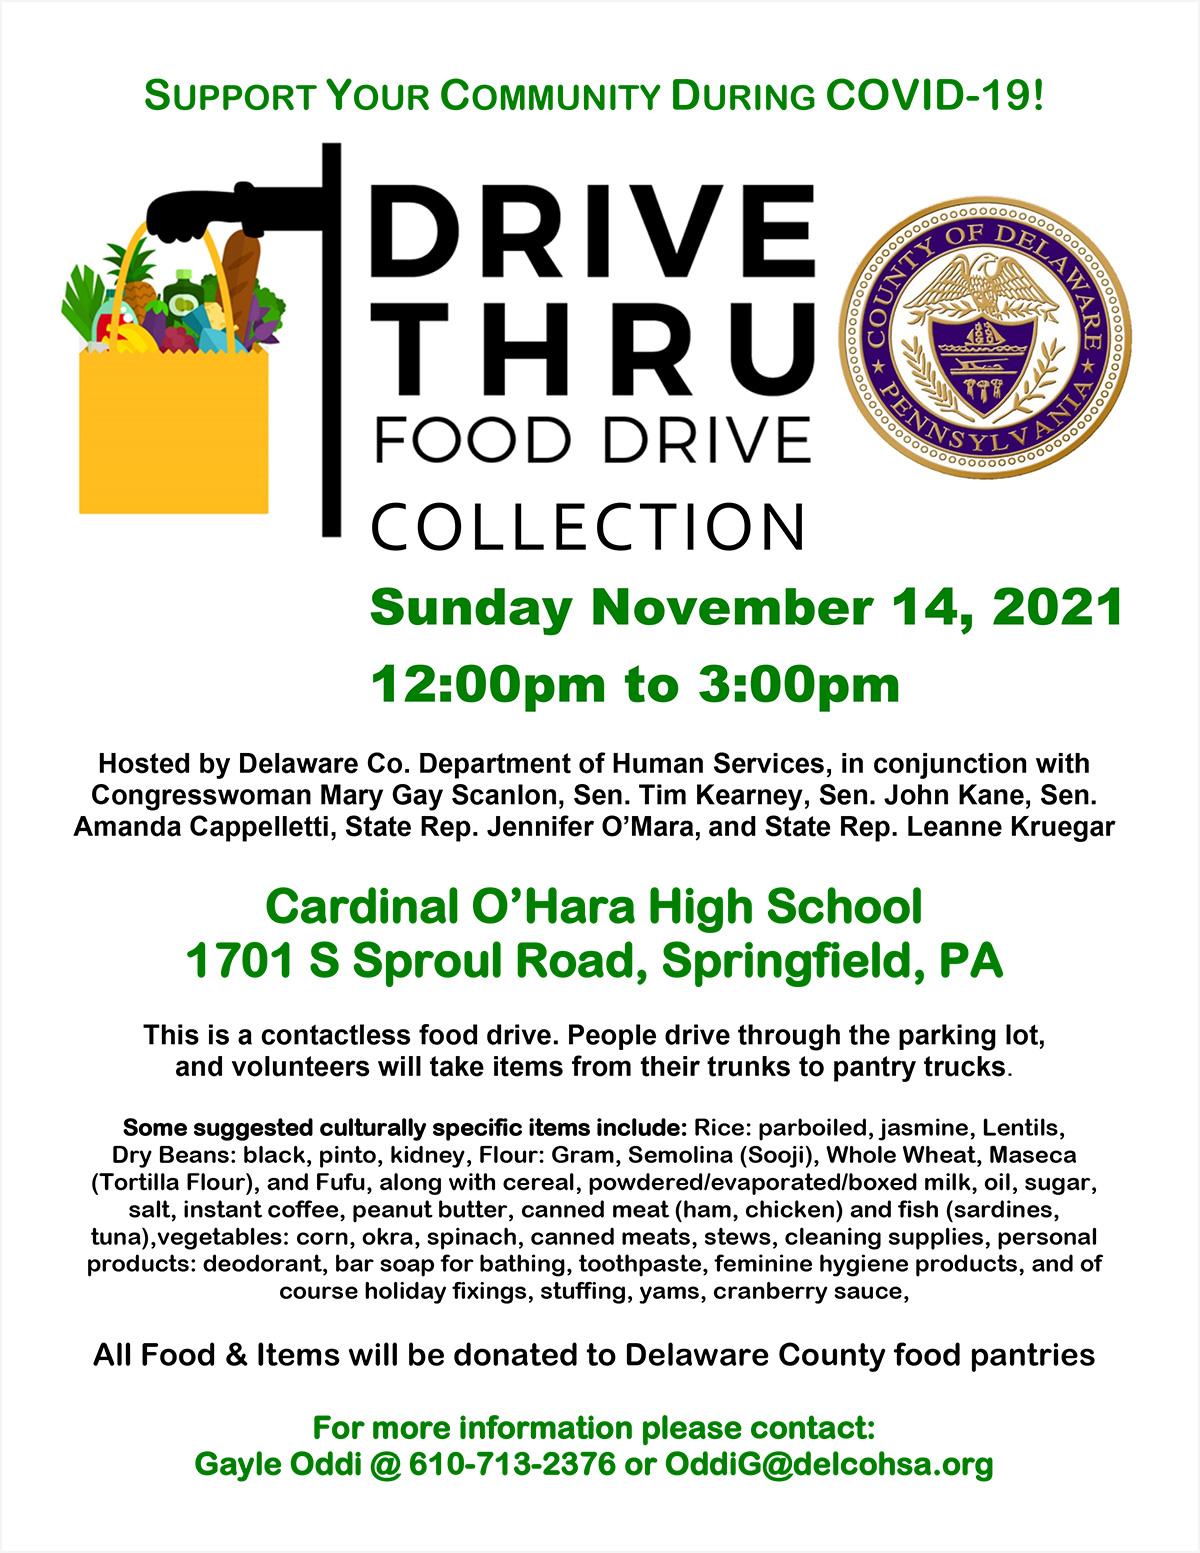 Drive Thru Food Drive Collection - November 14, 2021